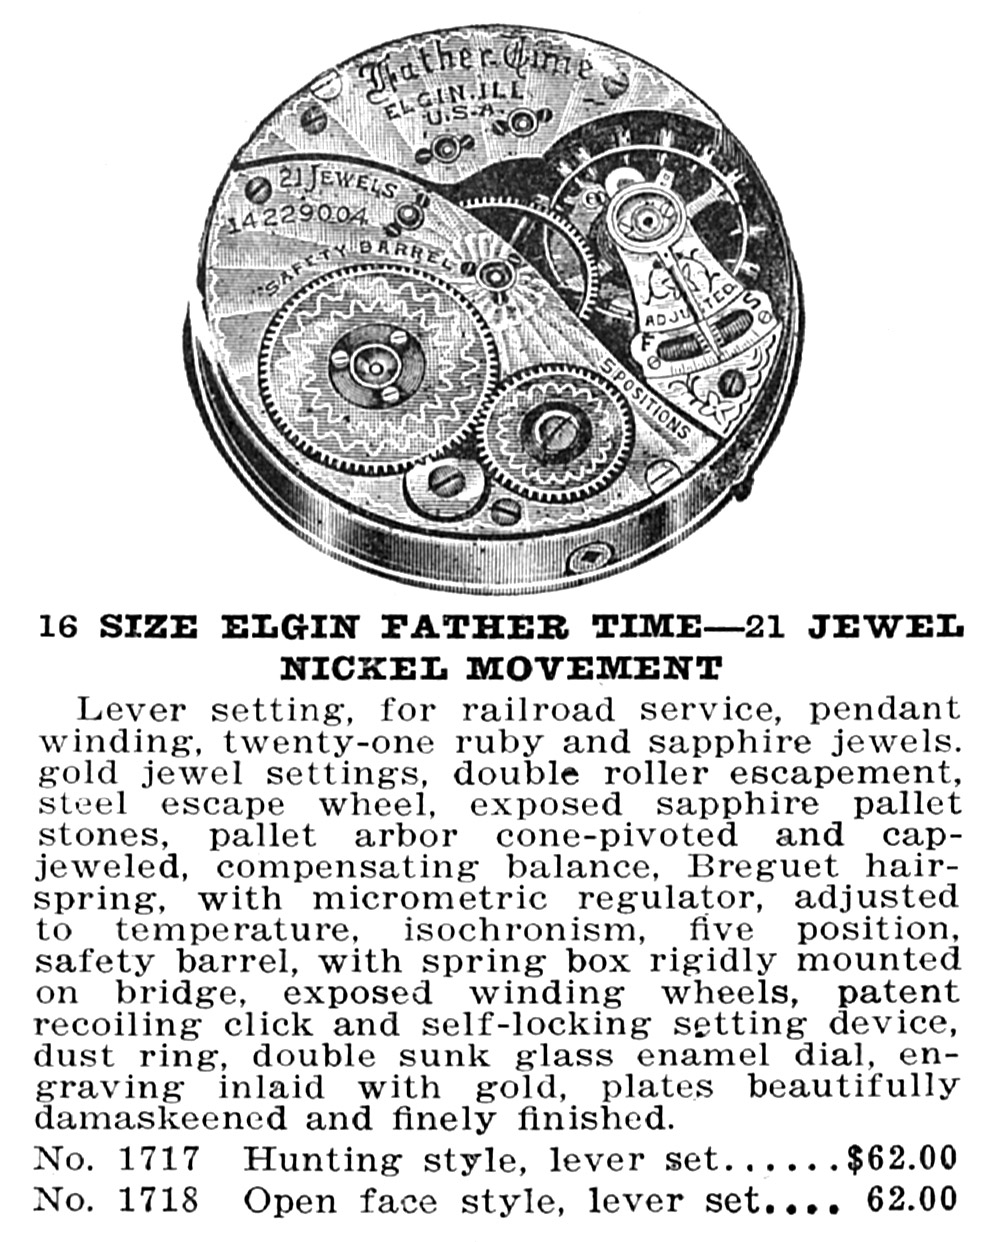 Elgin Pocket Watch: Serial Number 15423073 (Grade 374)